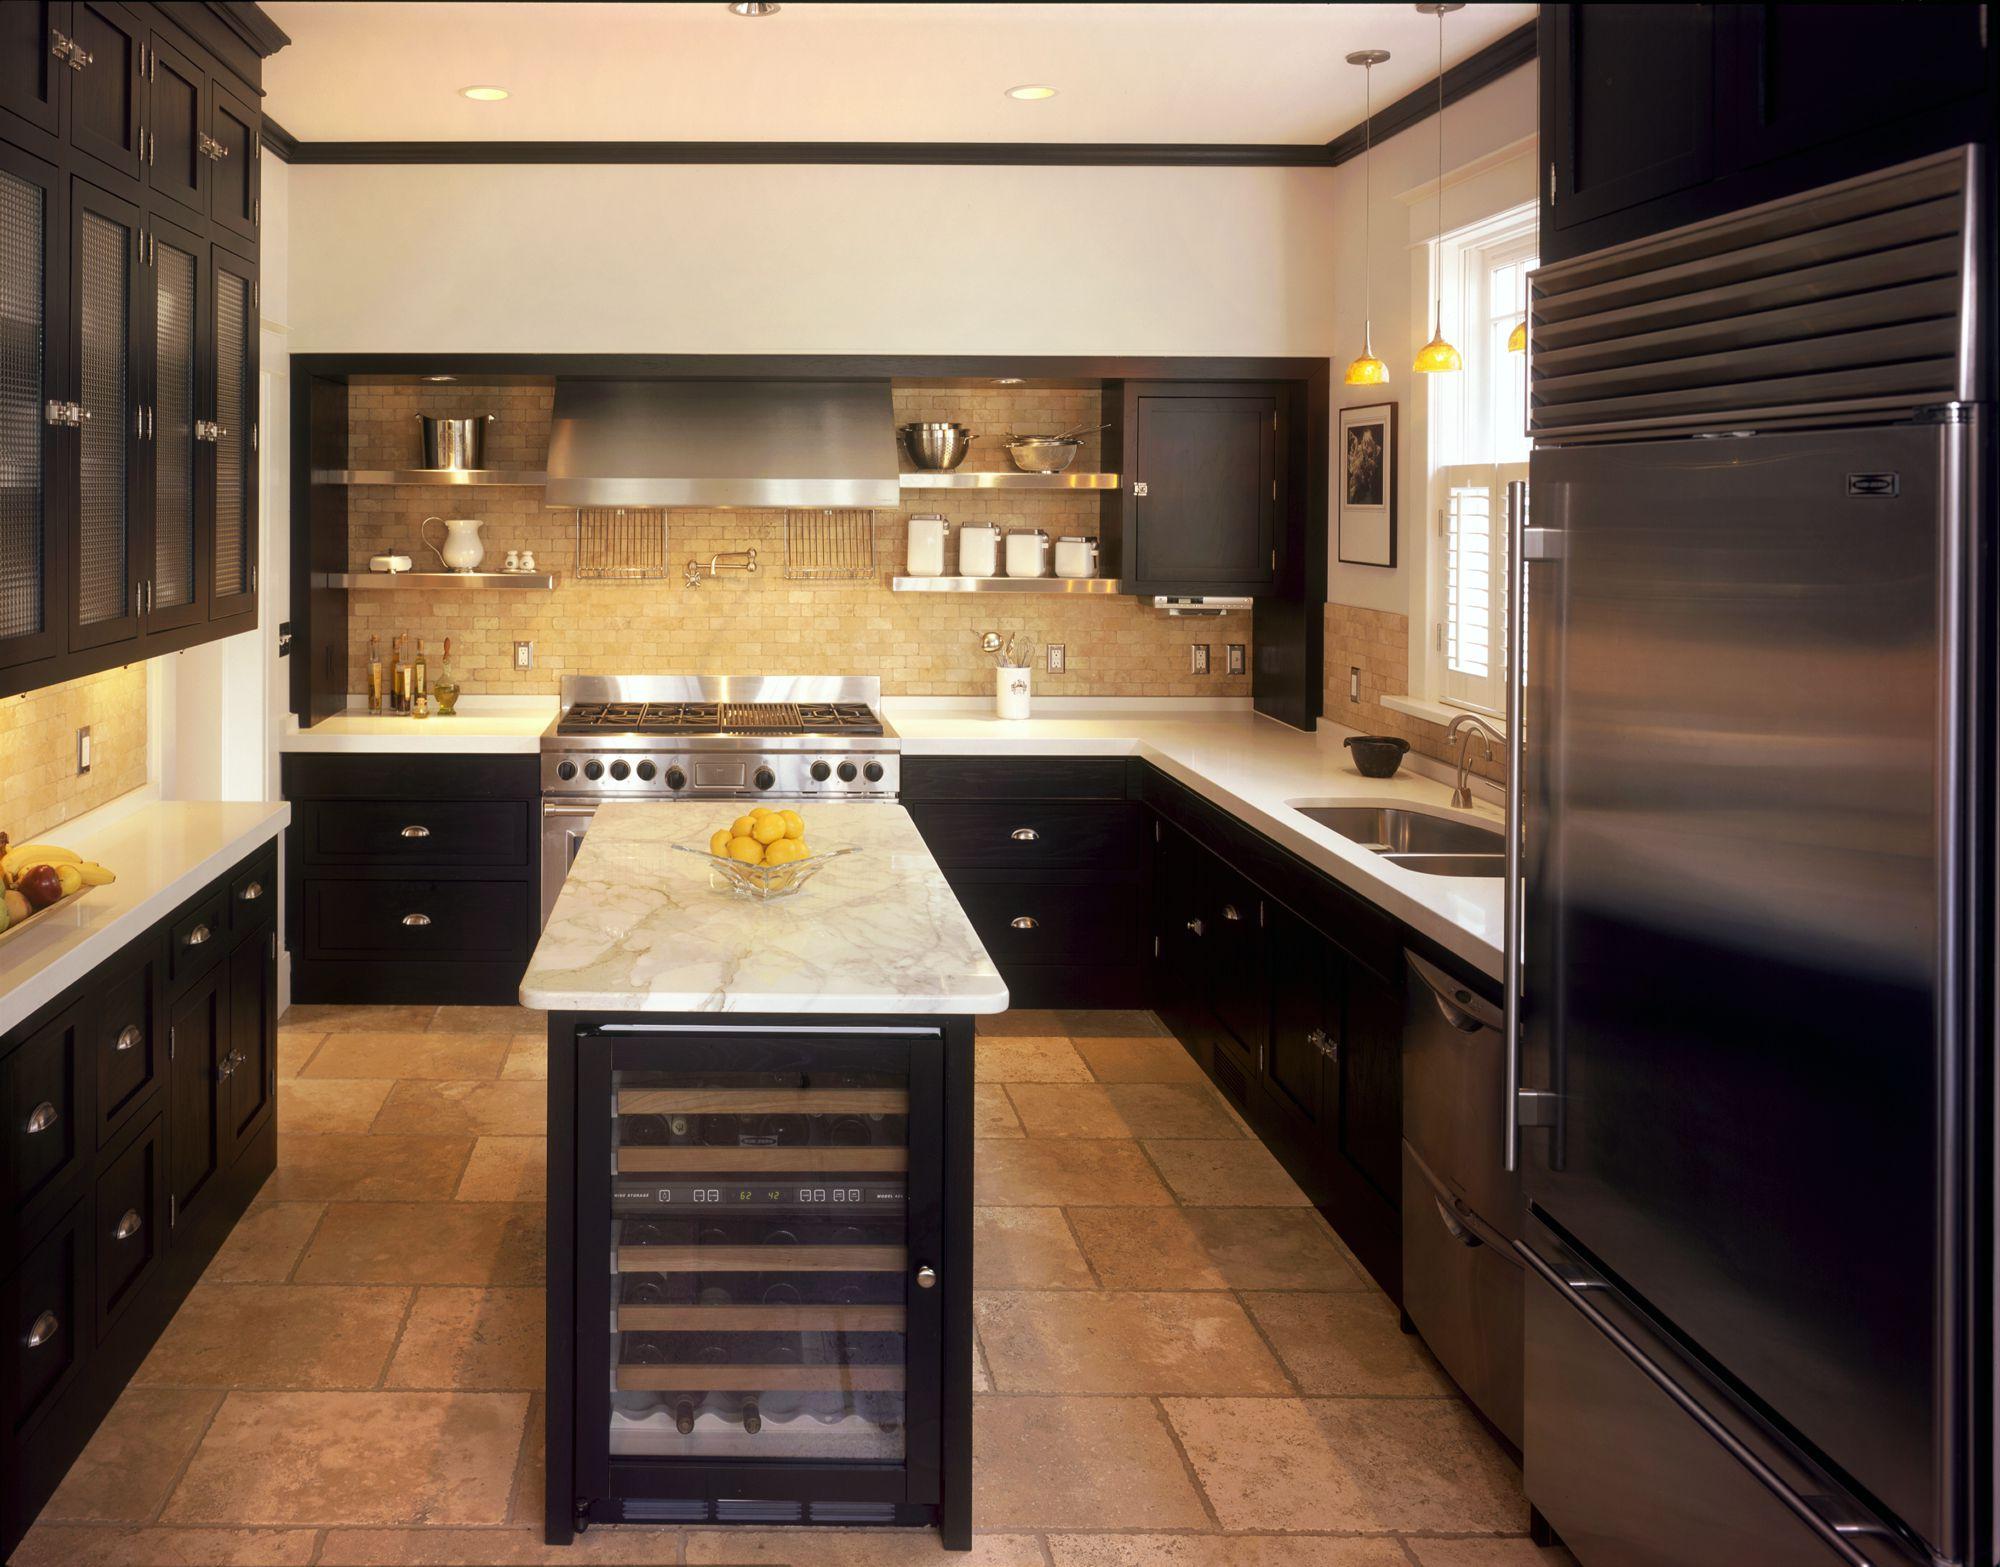 Kitchen Design Architect Kitchen John Teselle Architecture John Teselle  Architecture